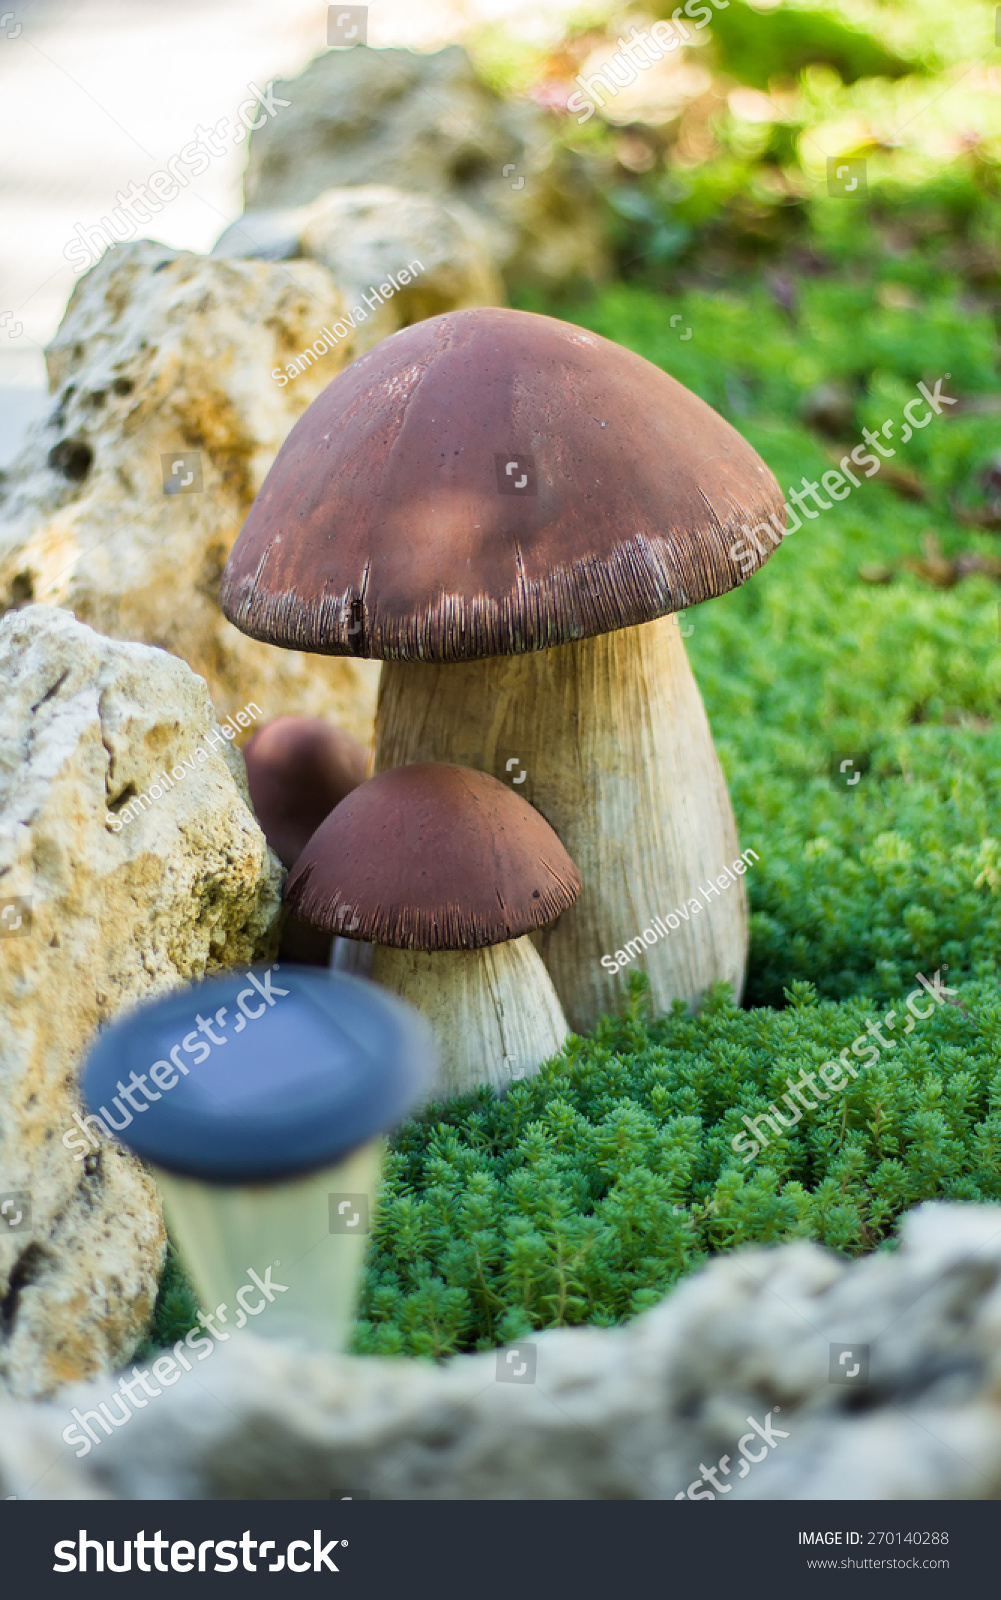 Ceramic Mushrooms Garden Decoration Stock Photo 270140288 - Shutterstock